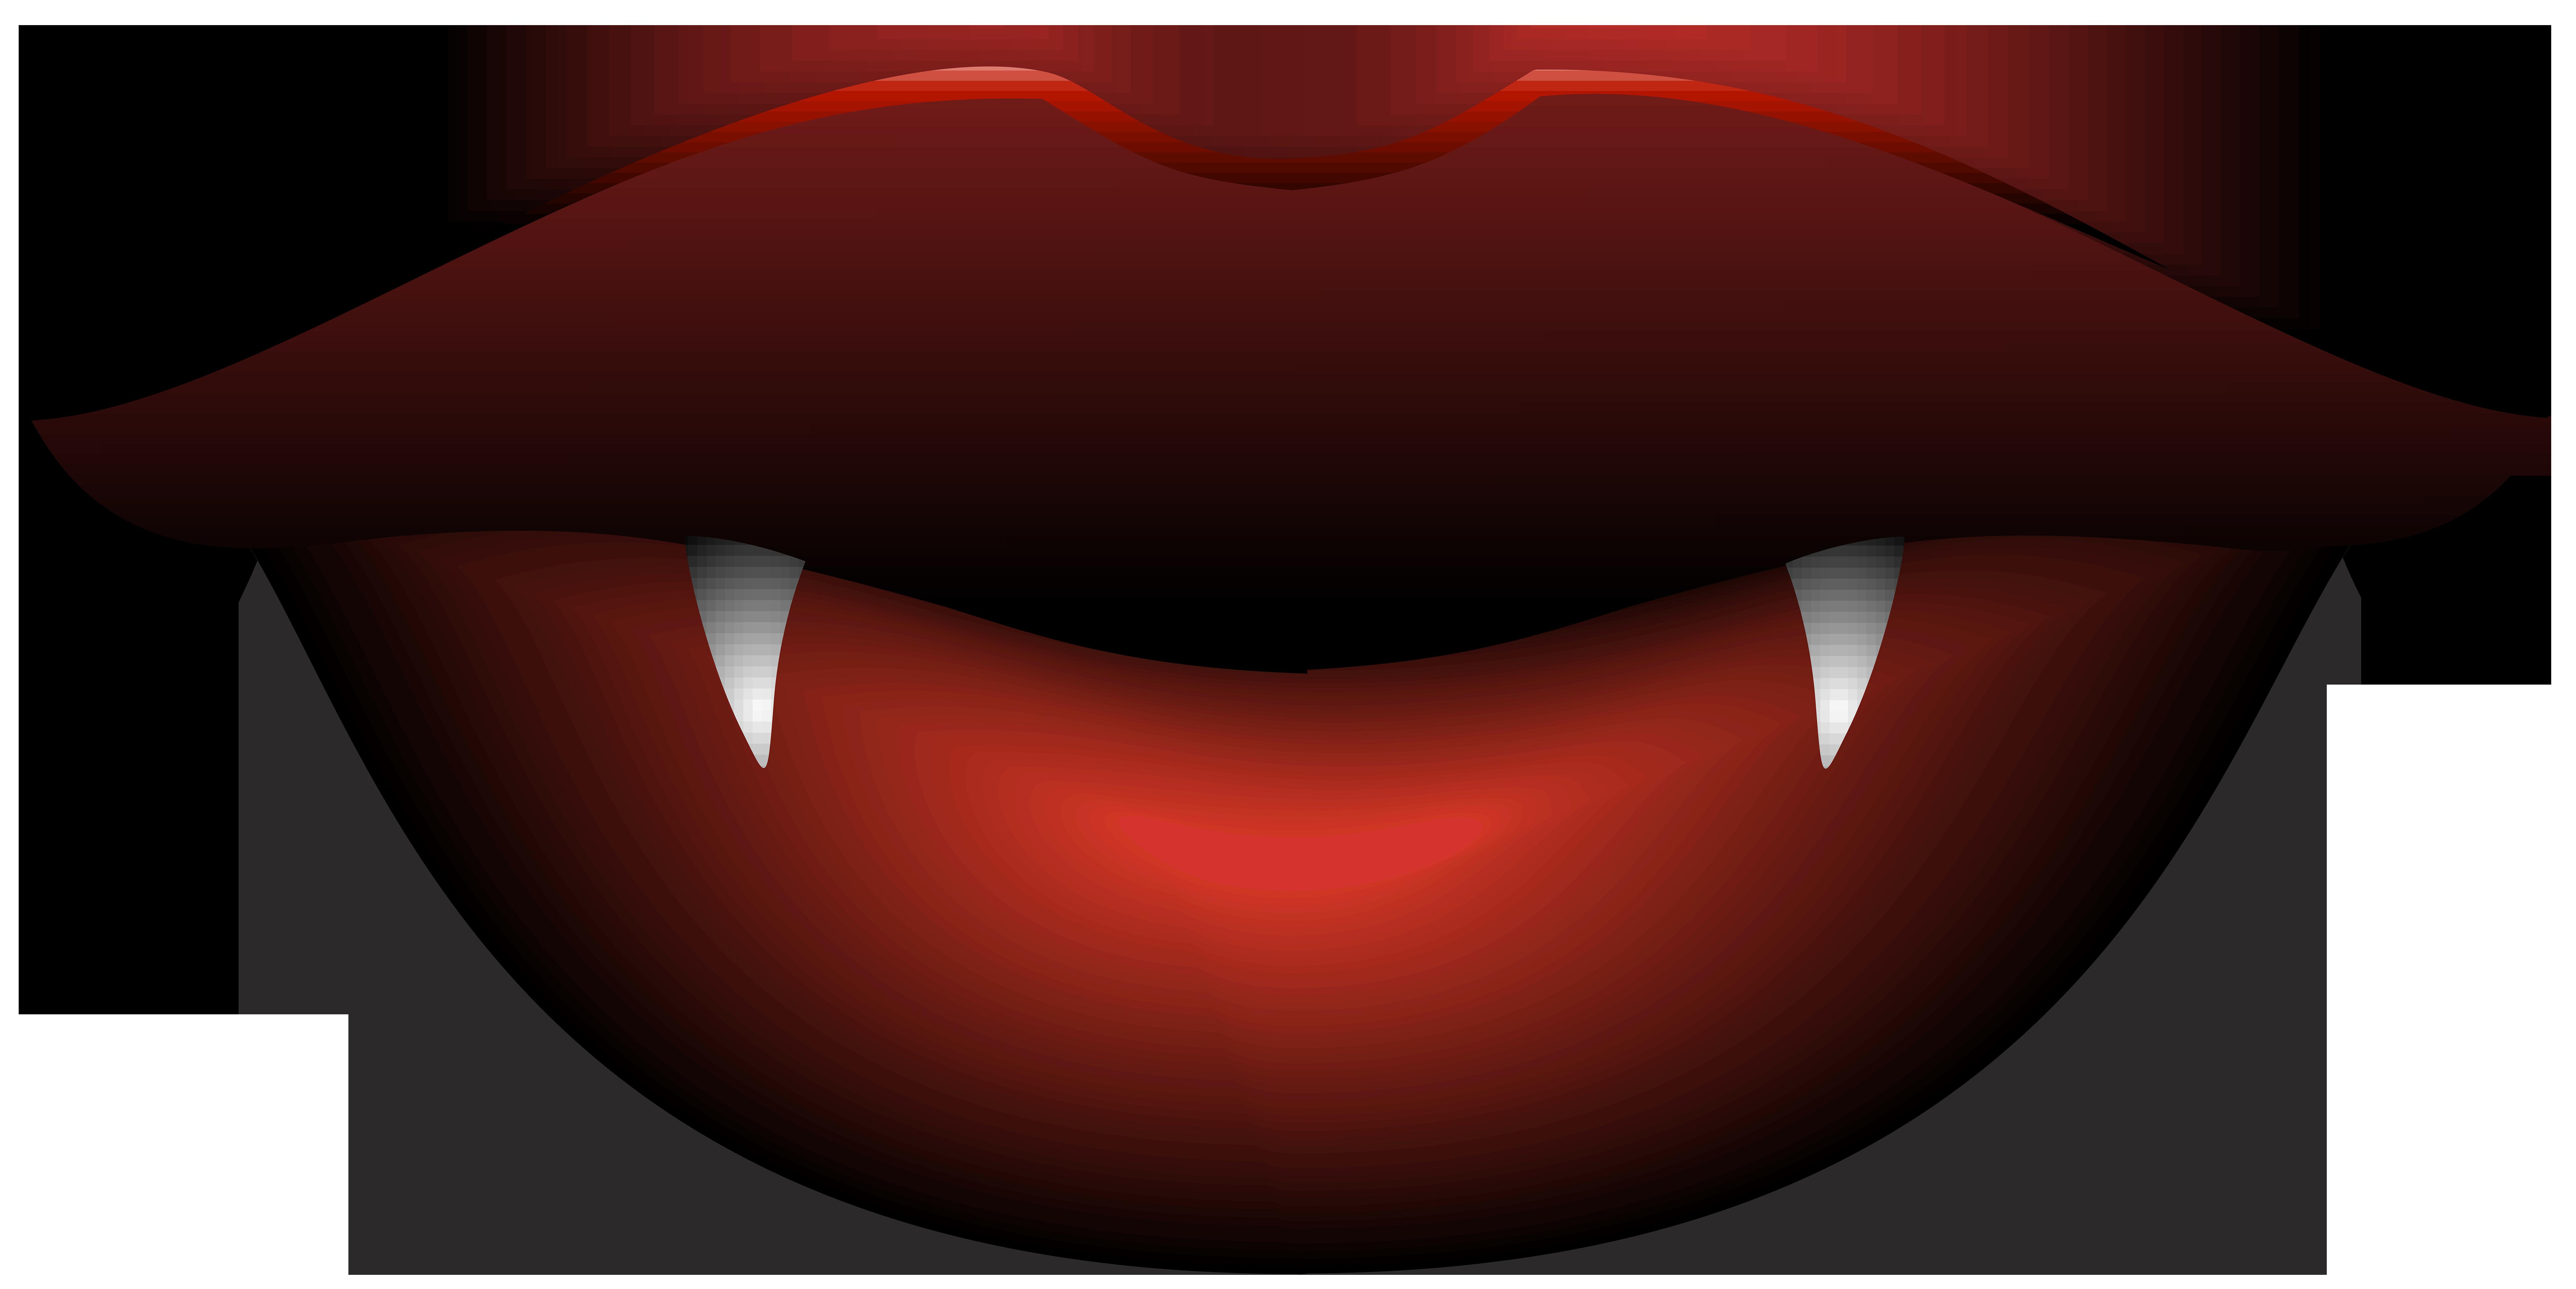 Vampire Lips Transparent PNG Clip Art Image.